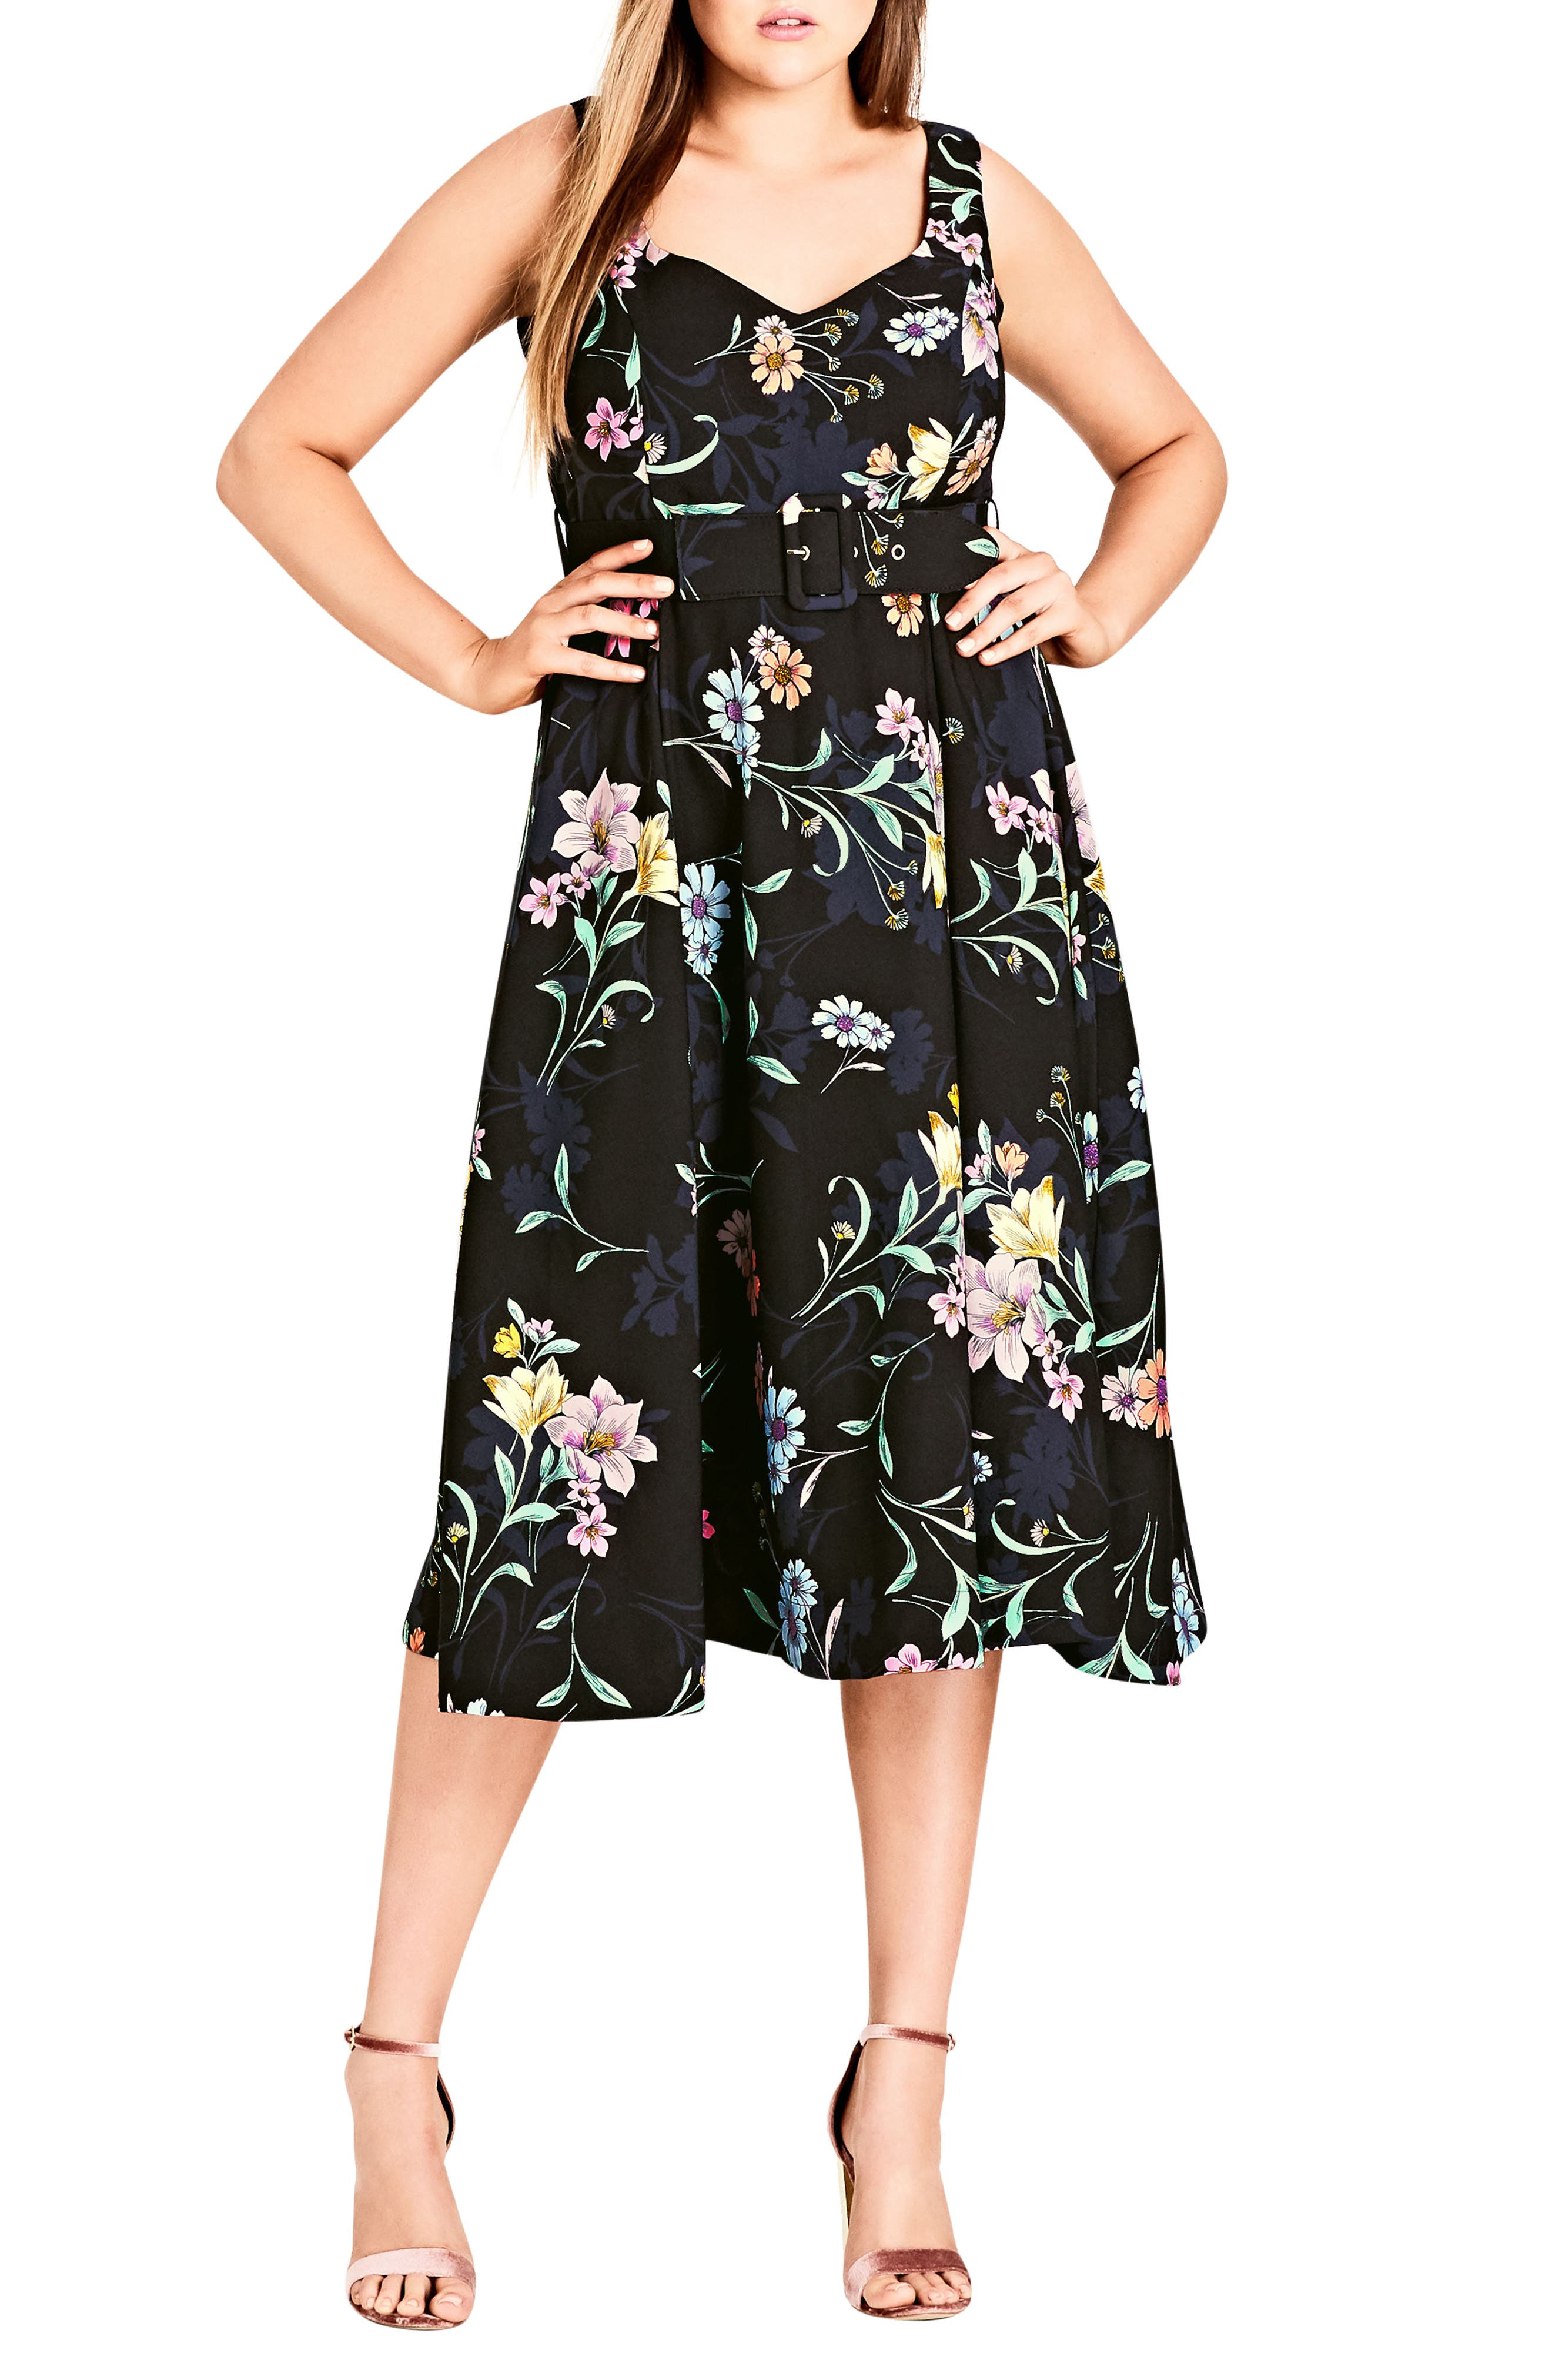 Sketch Love Floral A-Line Midi Dress,                         Main,                         color, BLACK